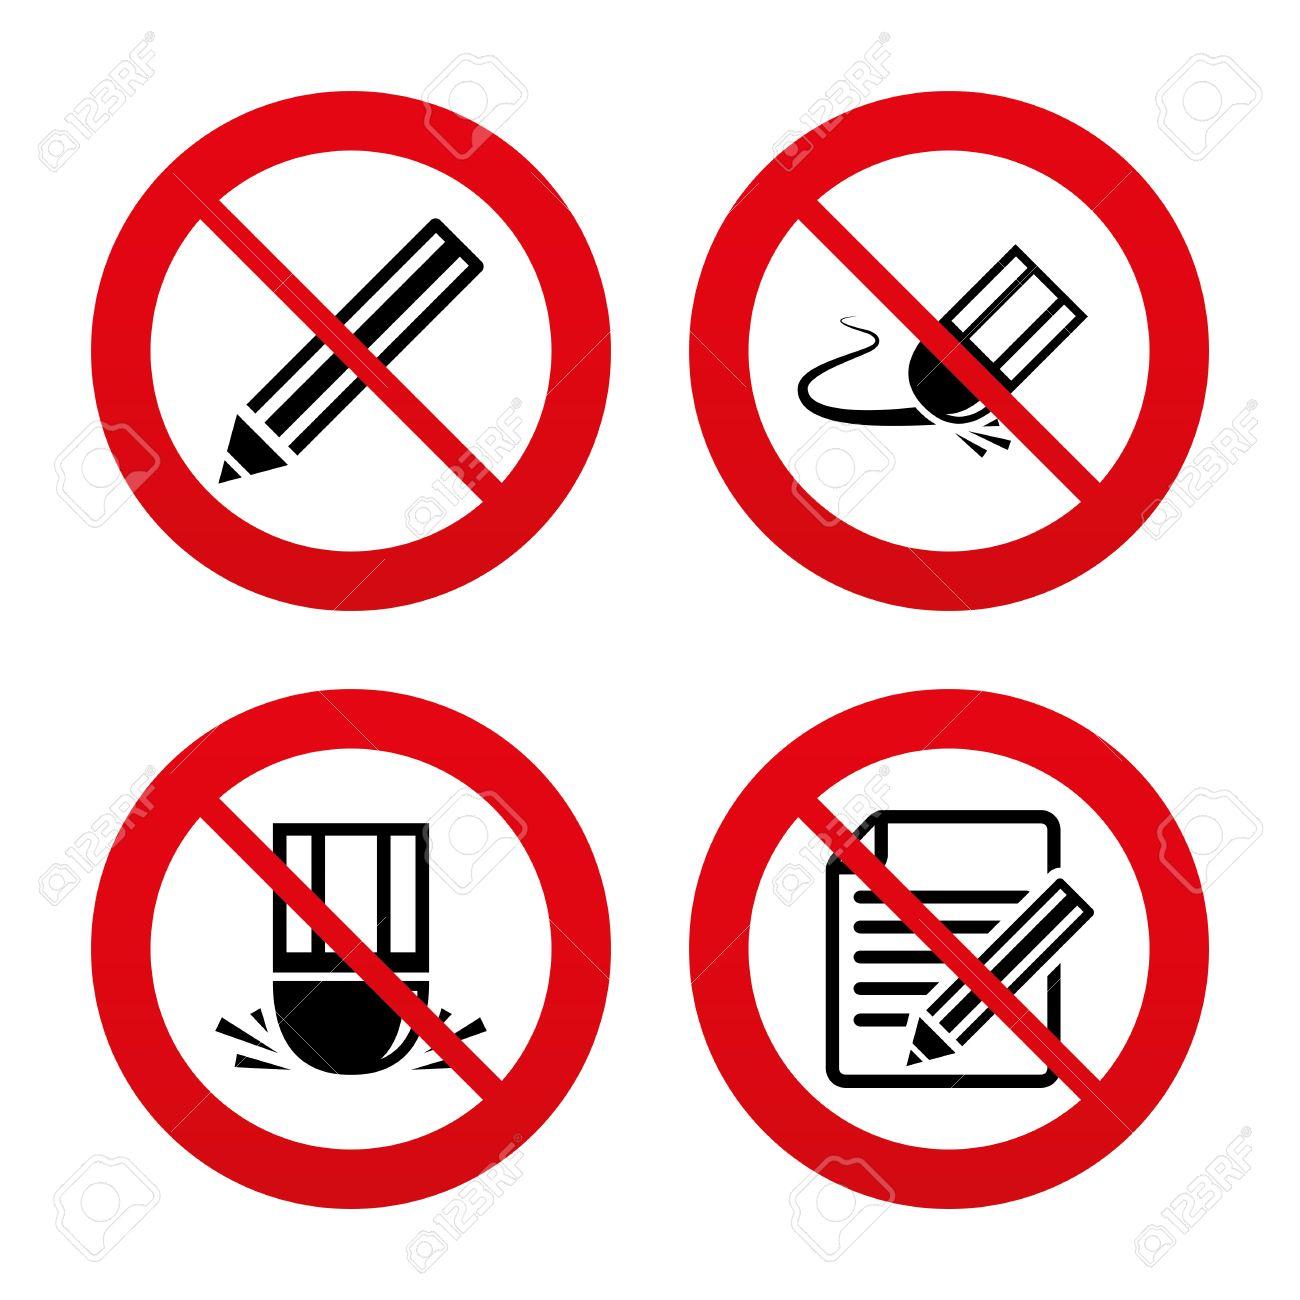 No, Ban or Stop signs  Pencil icon  Edit document file  Eraser